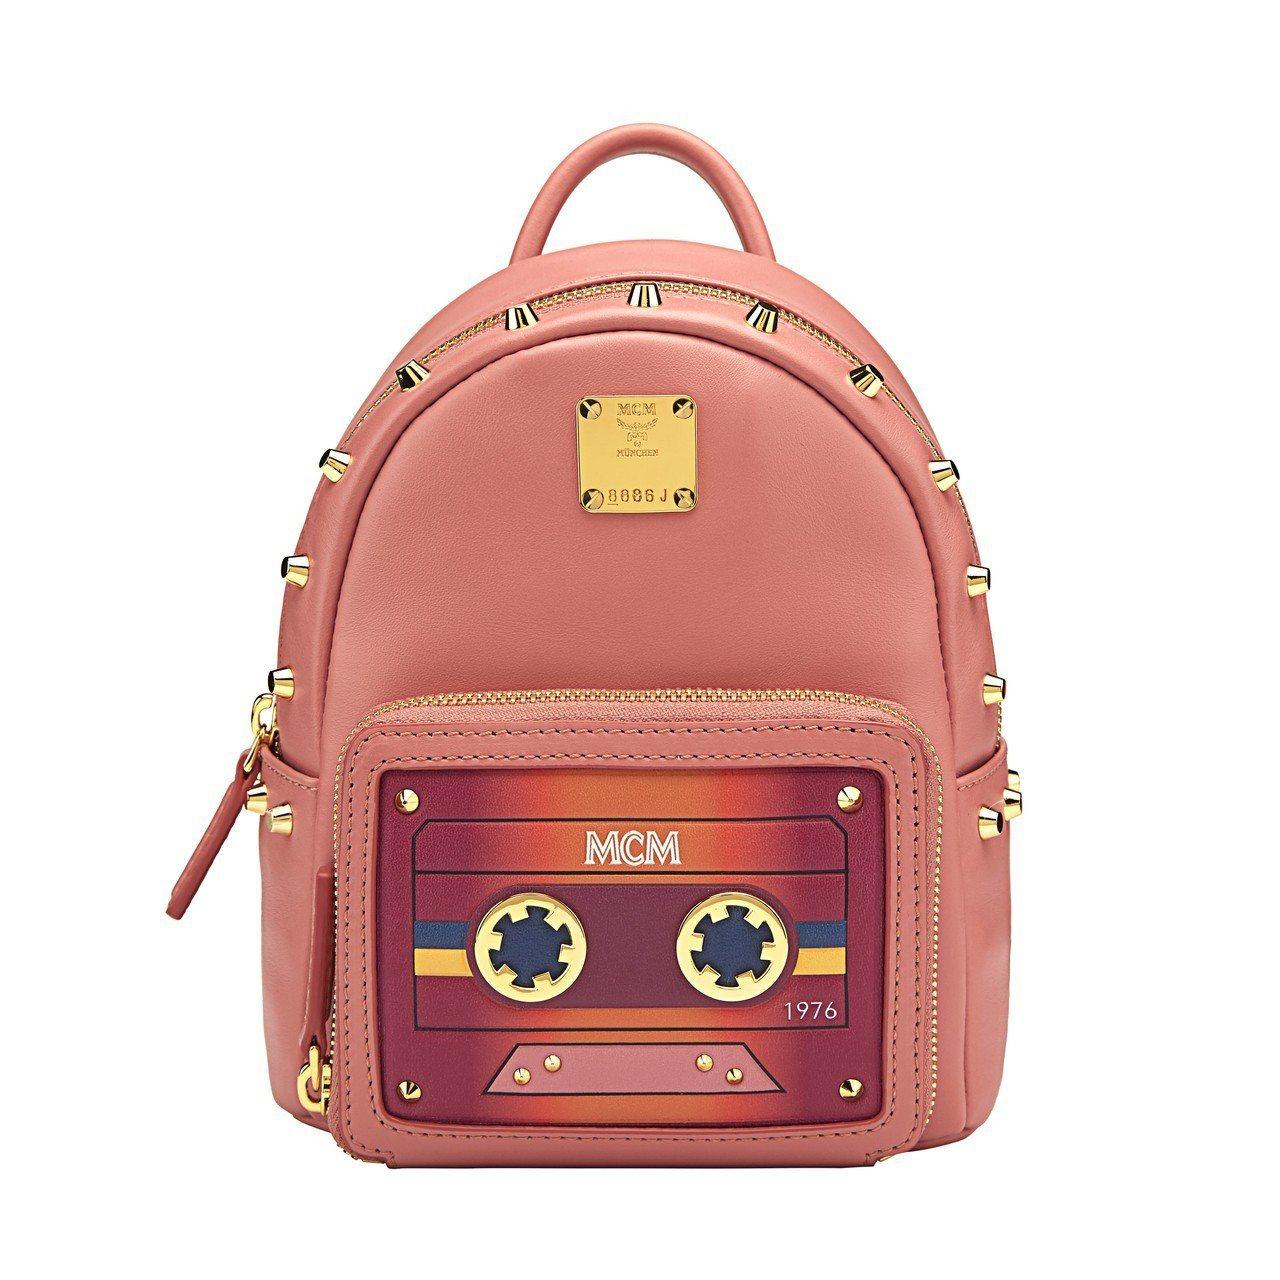 MCM CASSETTE迷你背包,售價34,500元。圖/台北101提供